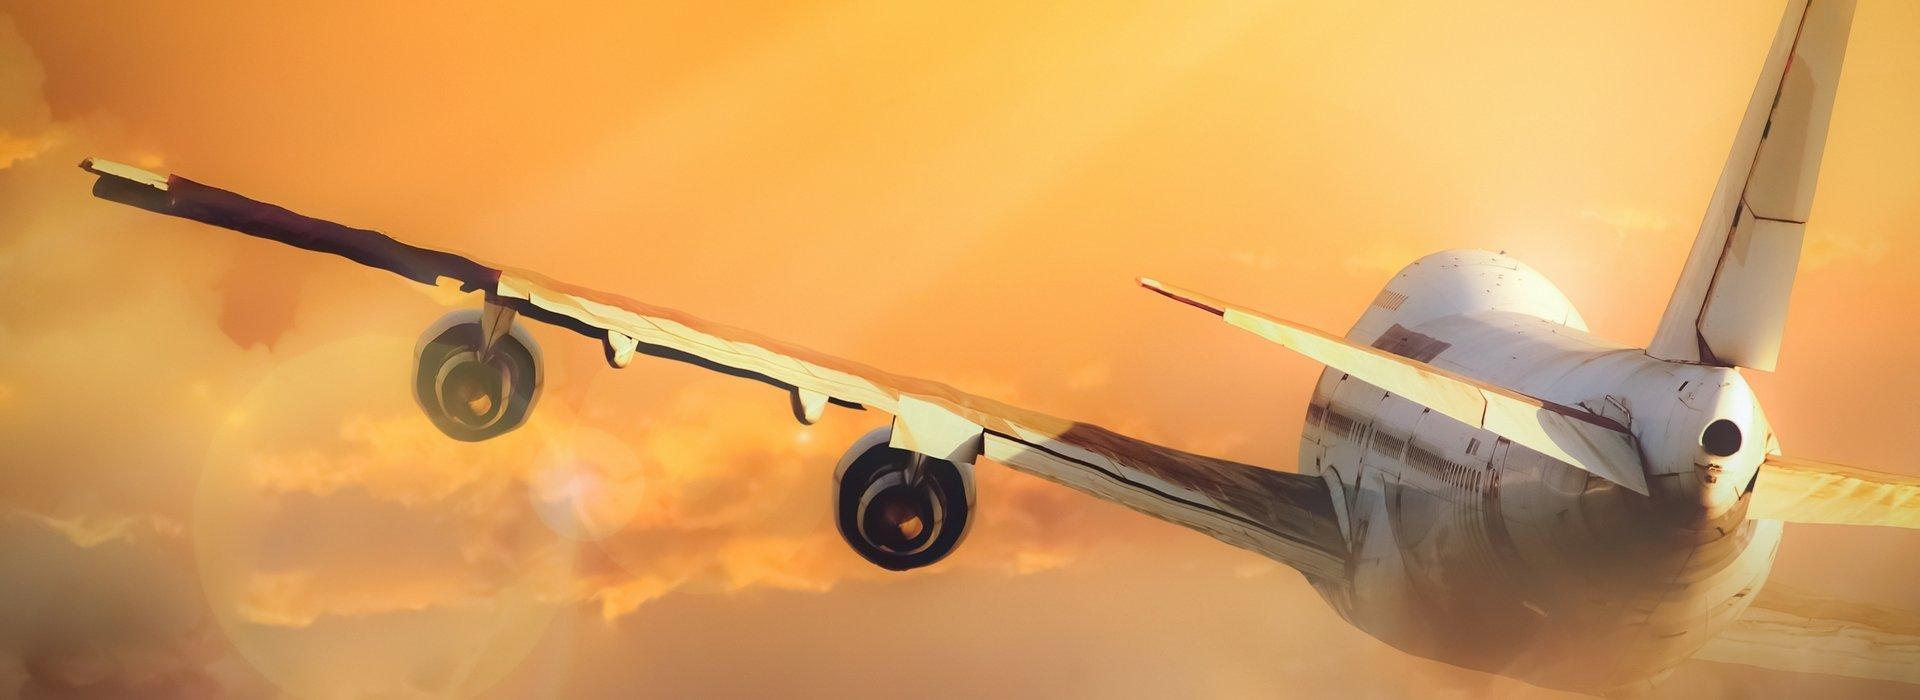 Reise nach Budapest mit dem Flugzeug – Budapest Reisen